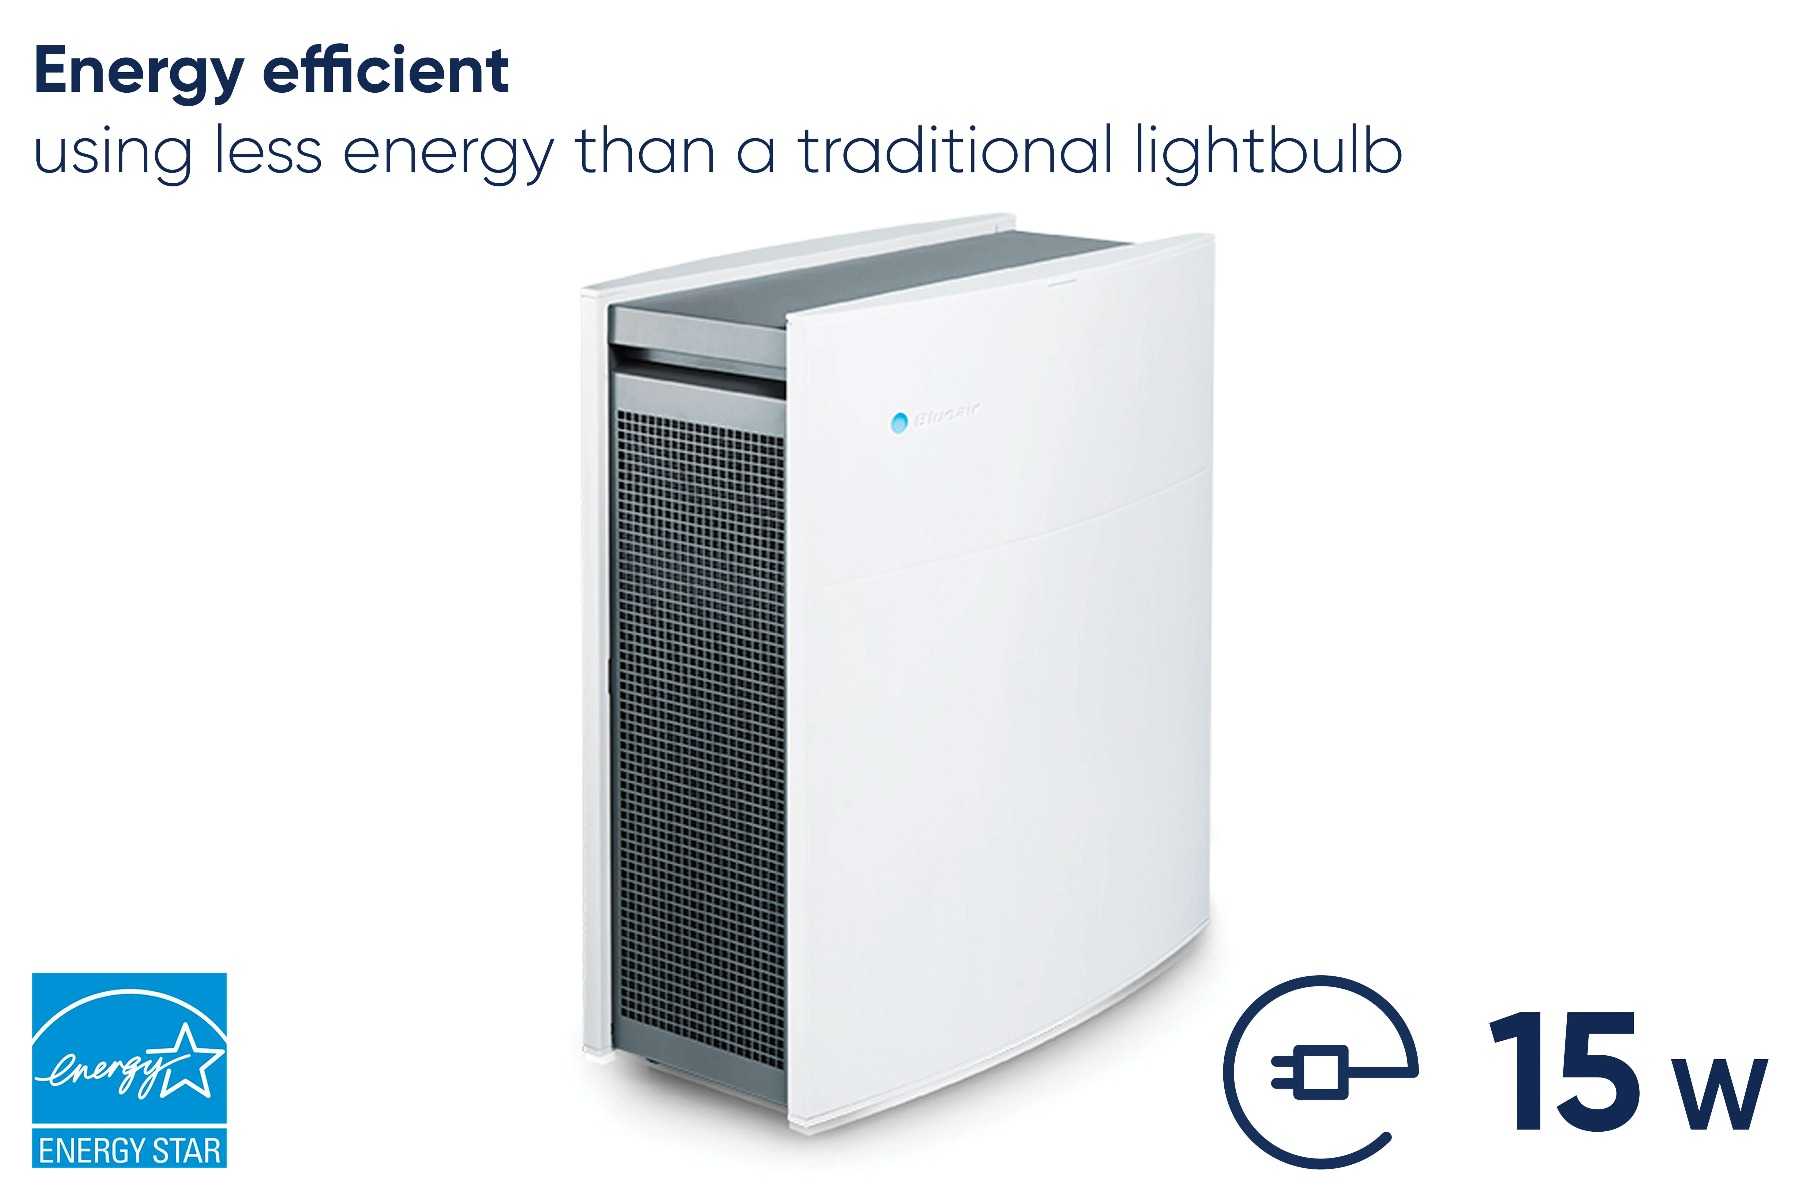 Blueair Classic 405 Air Purifier Energy efficient